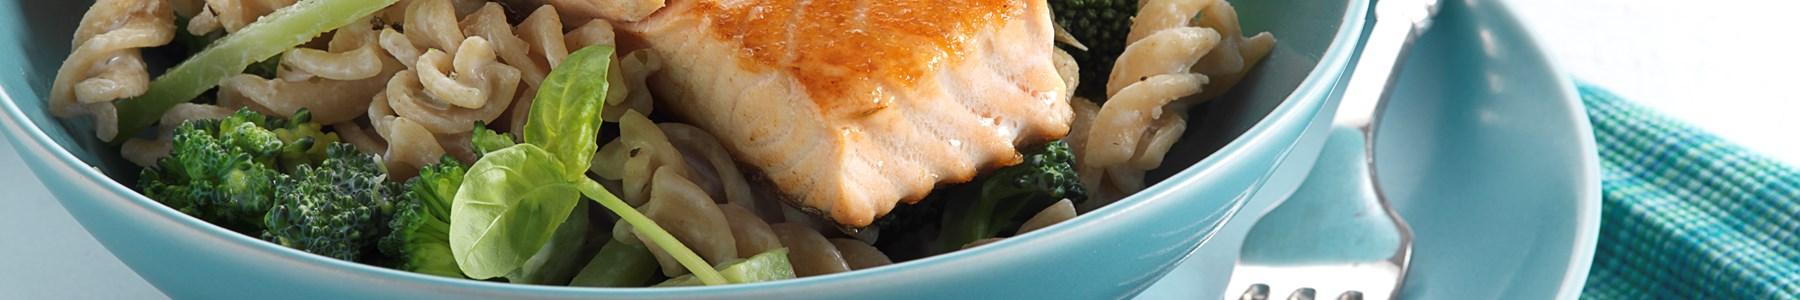 Broccoli + Fisk og skaldyr